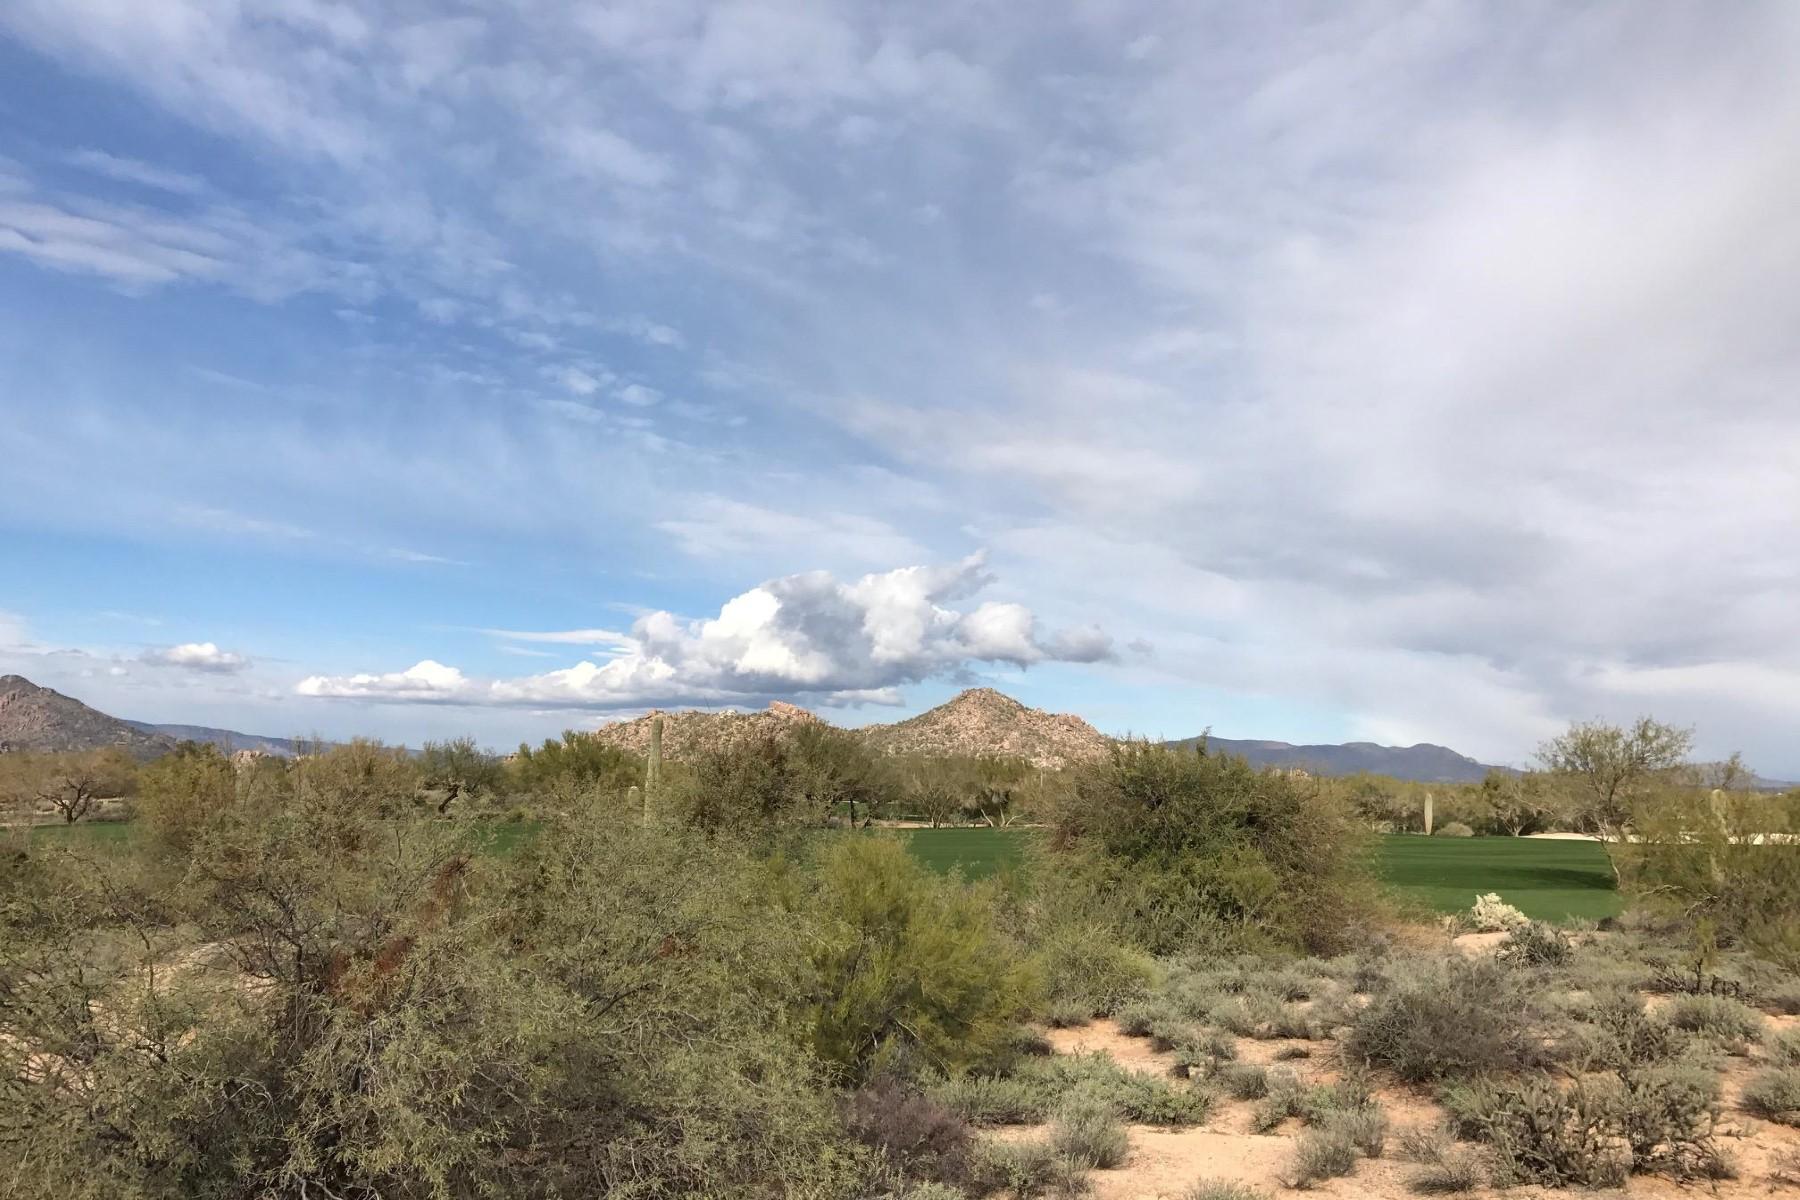 土地 为 销售 在 Beautiful lot on the golf course in Whisper Rock 7618 E Whisper Rock Trl #50 斯科茨代尔, 亚利桑那州, 85266 美国